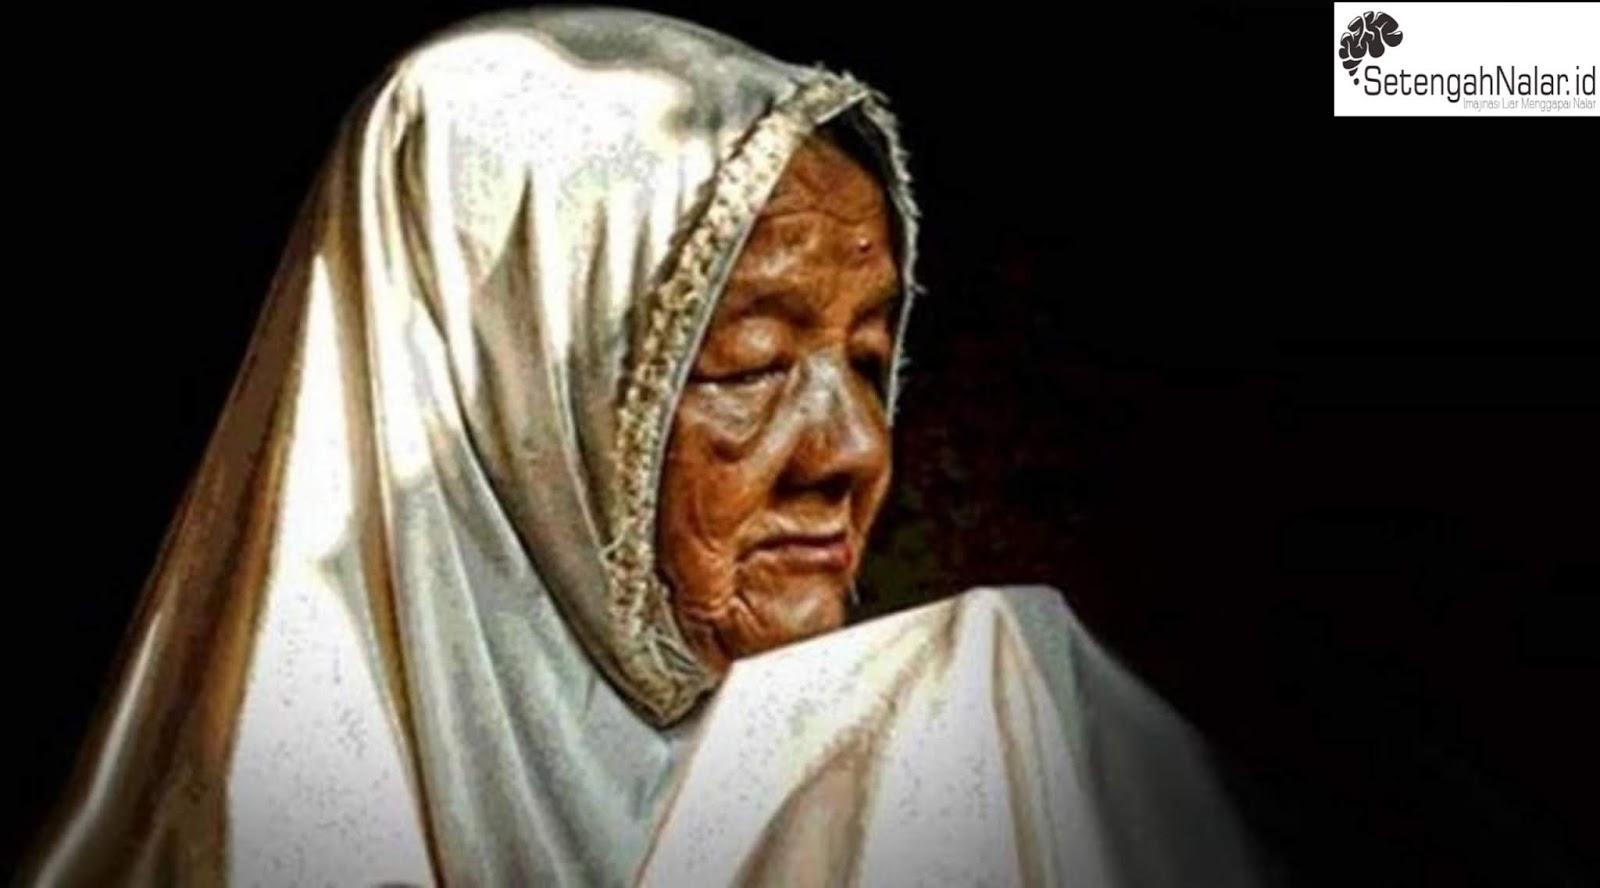 Pernahkah Kita Bangga dan Bersyukur serta mendoakan Ibu Kita?